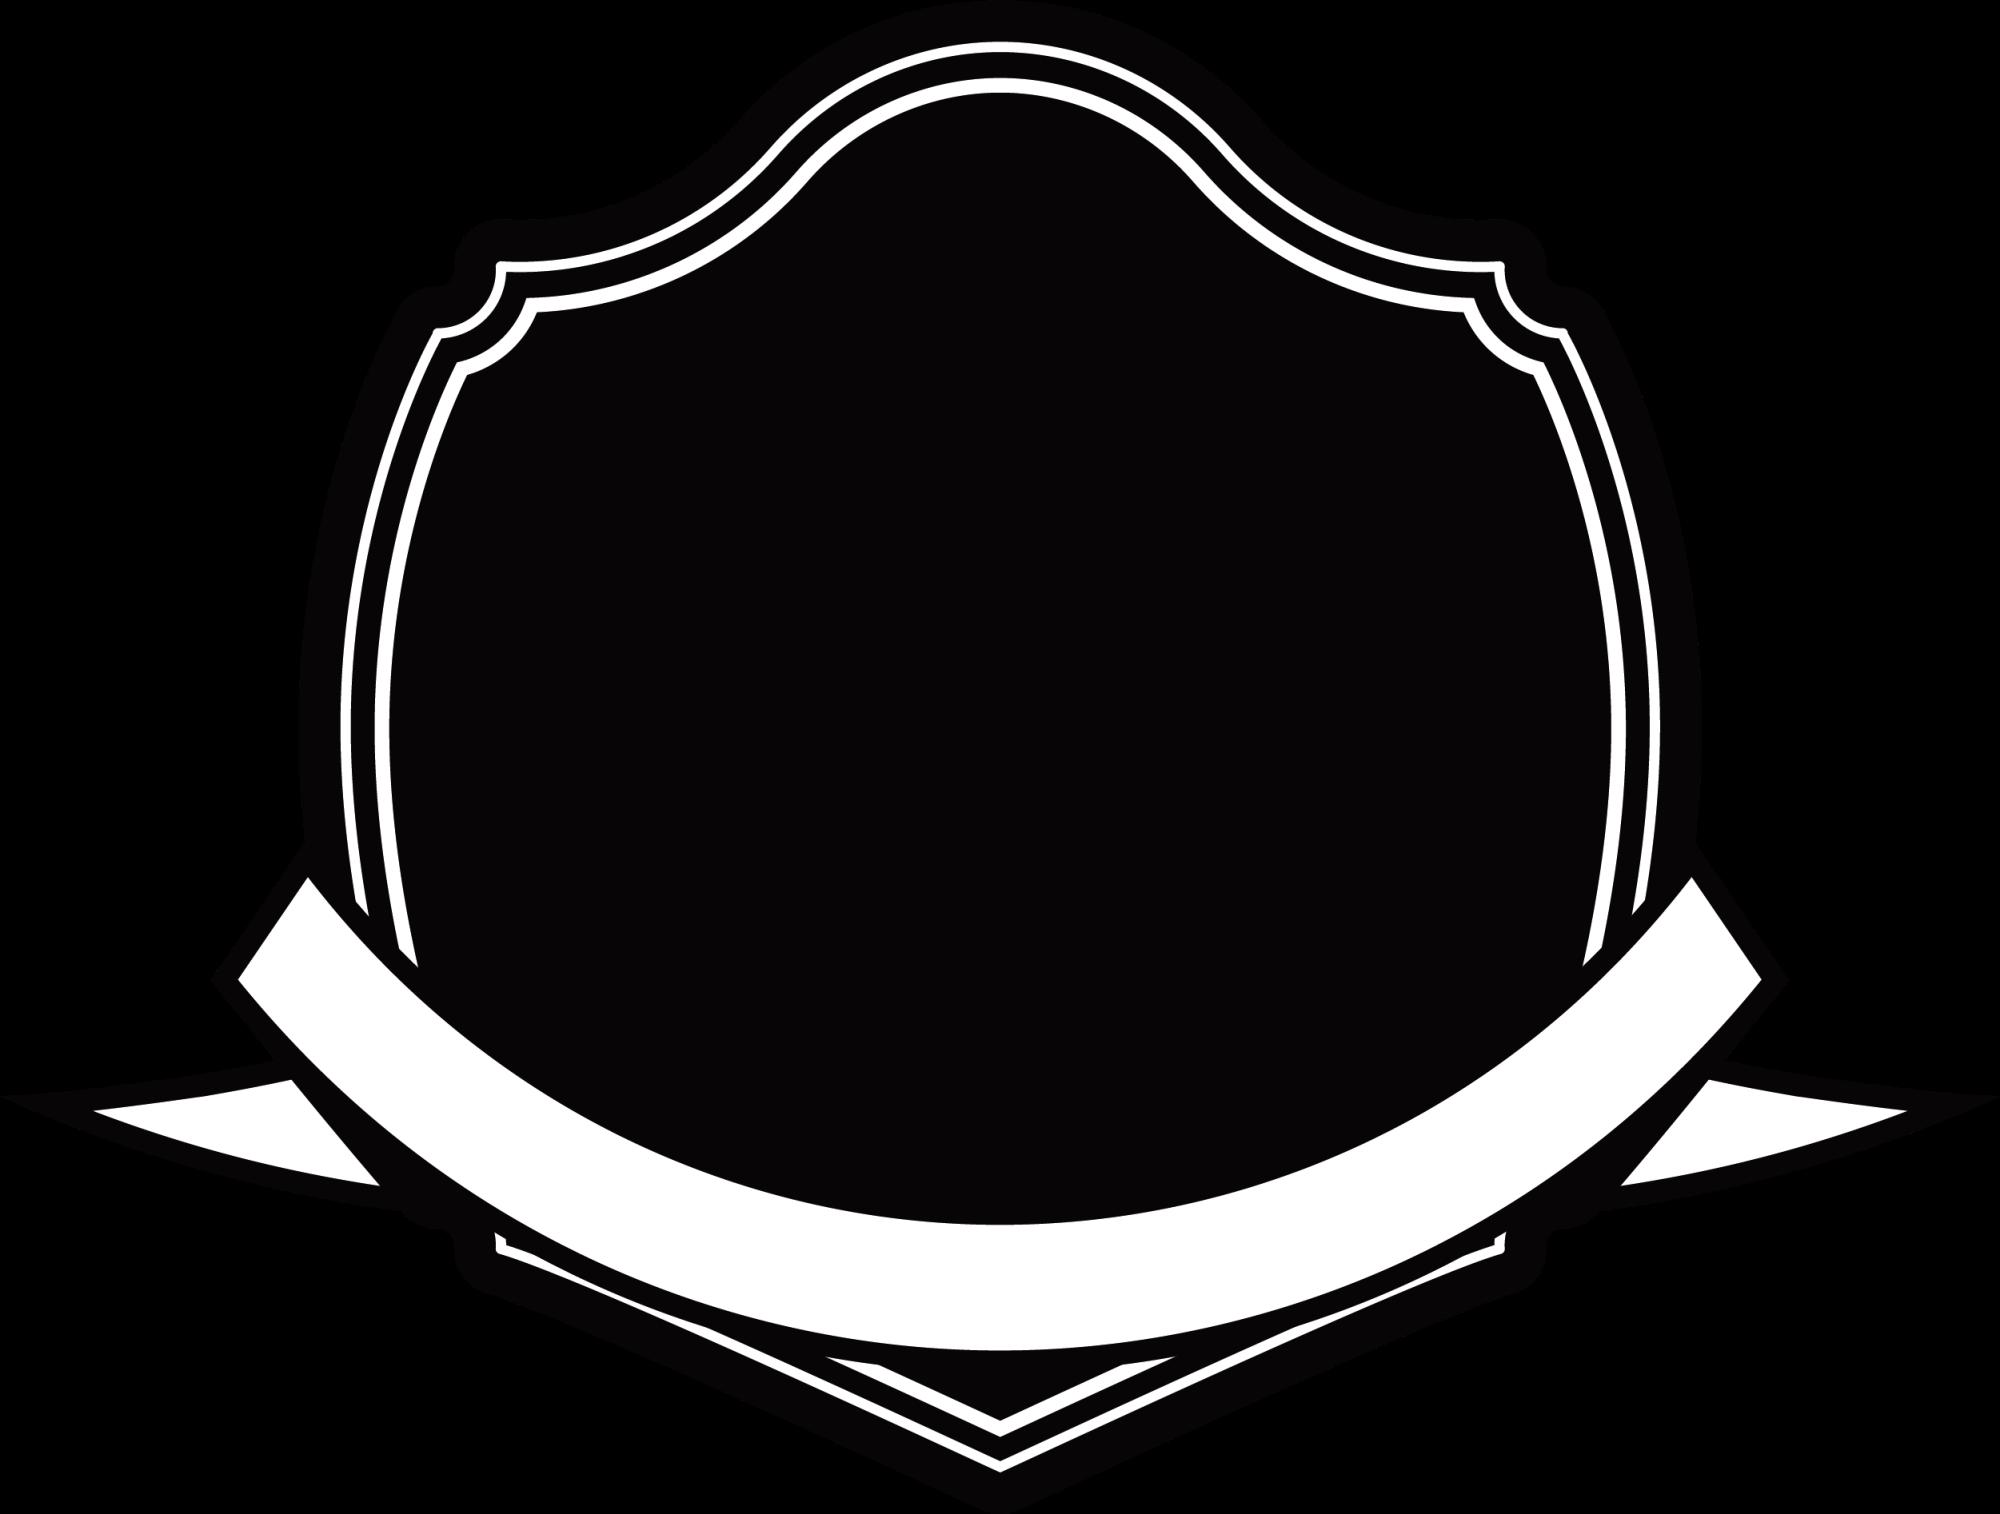 Black and white transprent. Clipart shield ribbon